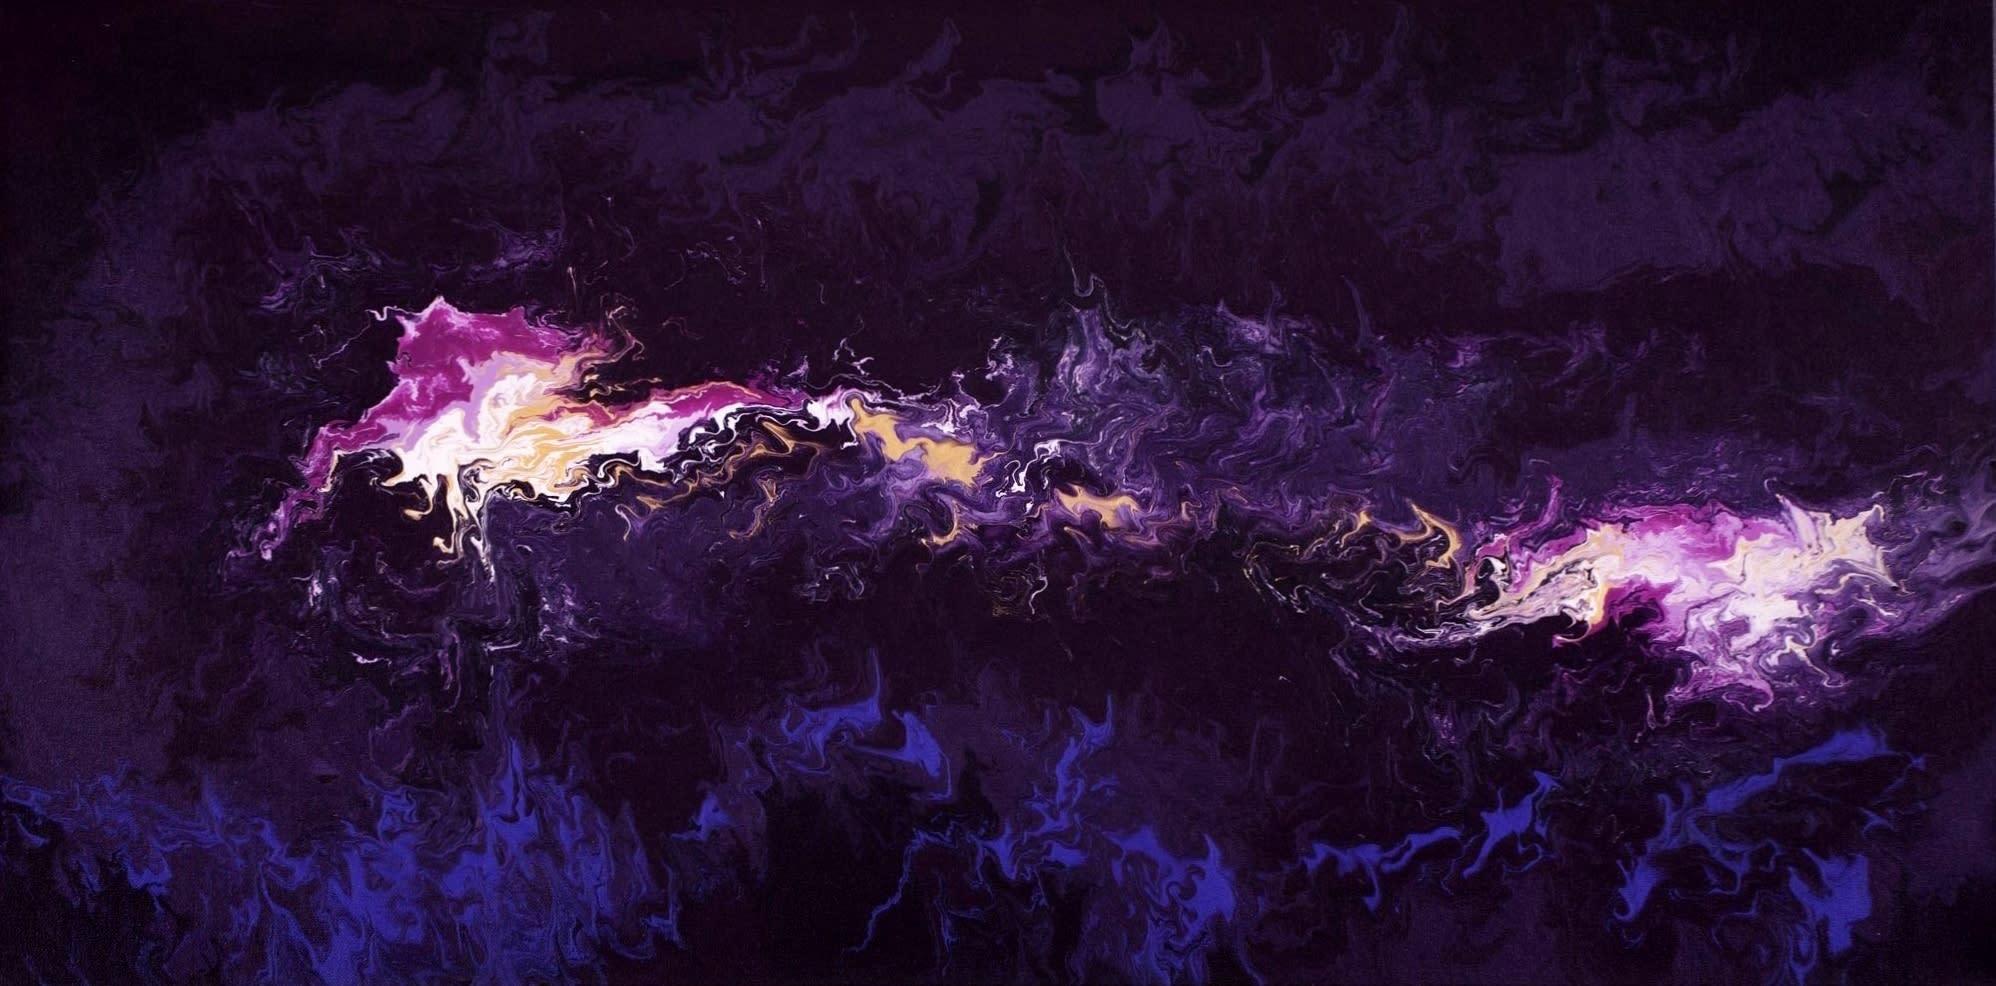 Cosmic separation rqel6i